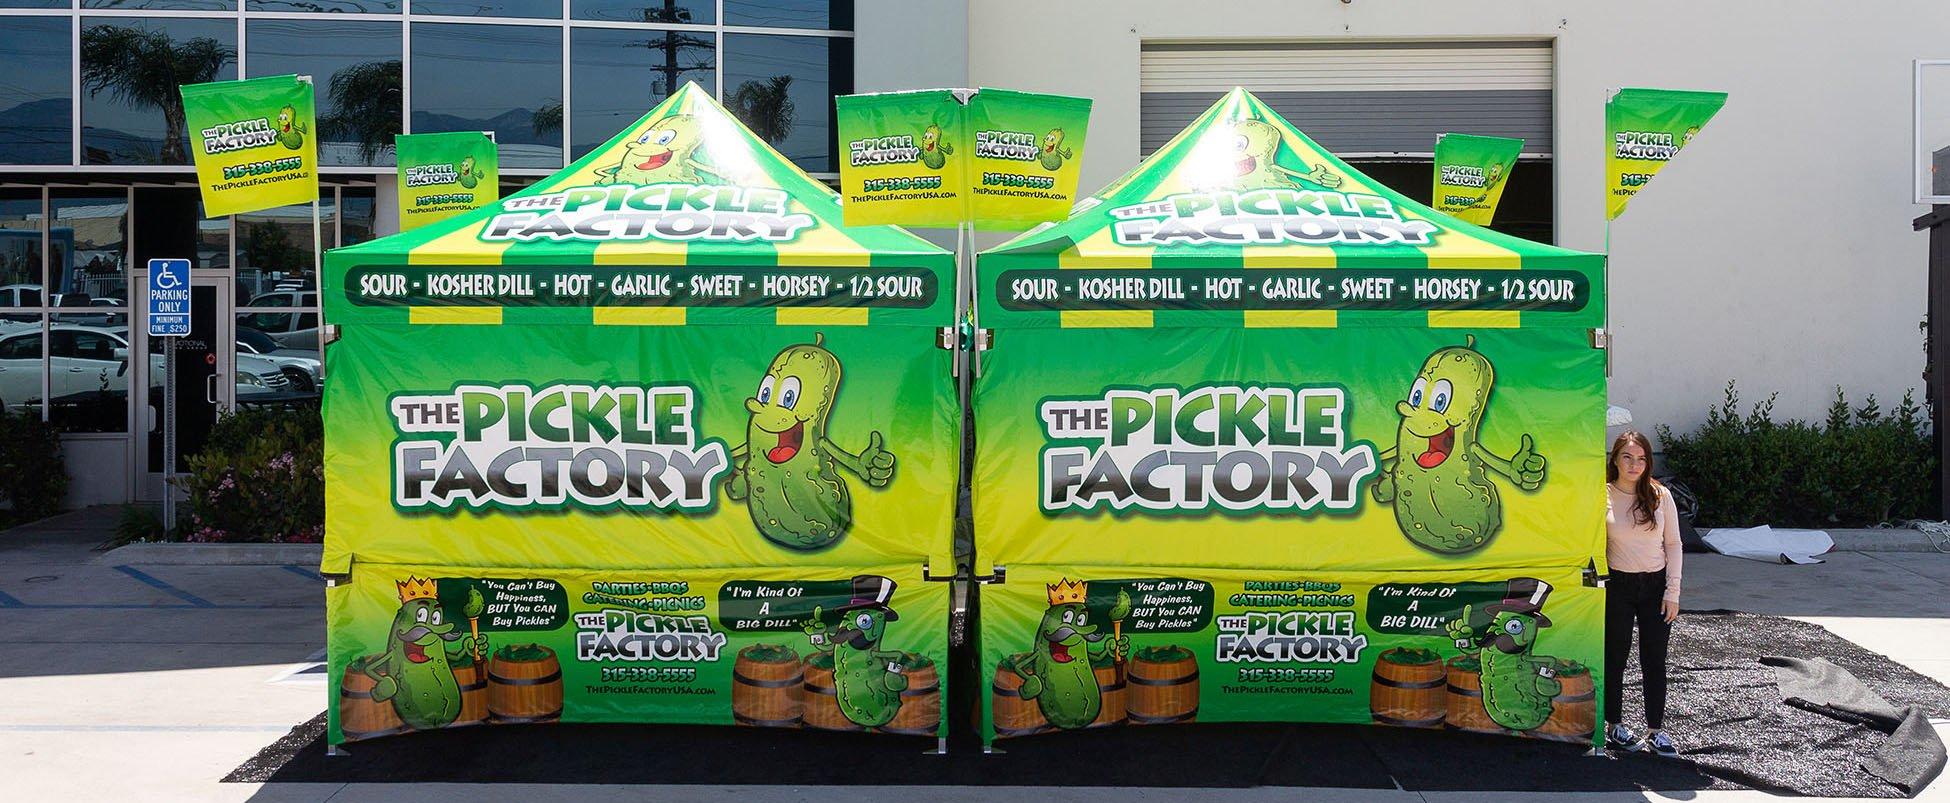 the-pickle-factory-header.jpg